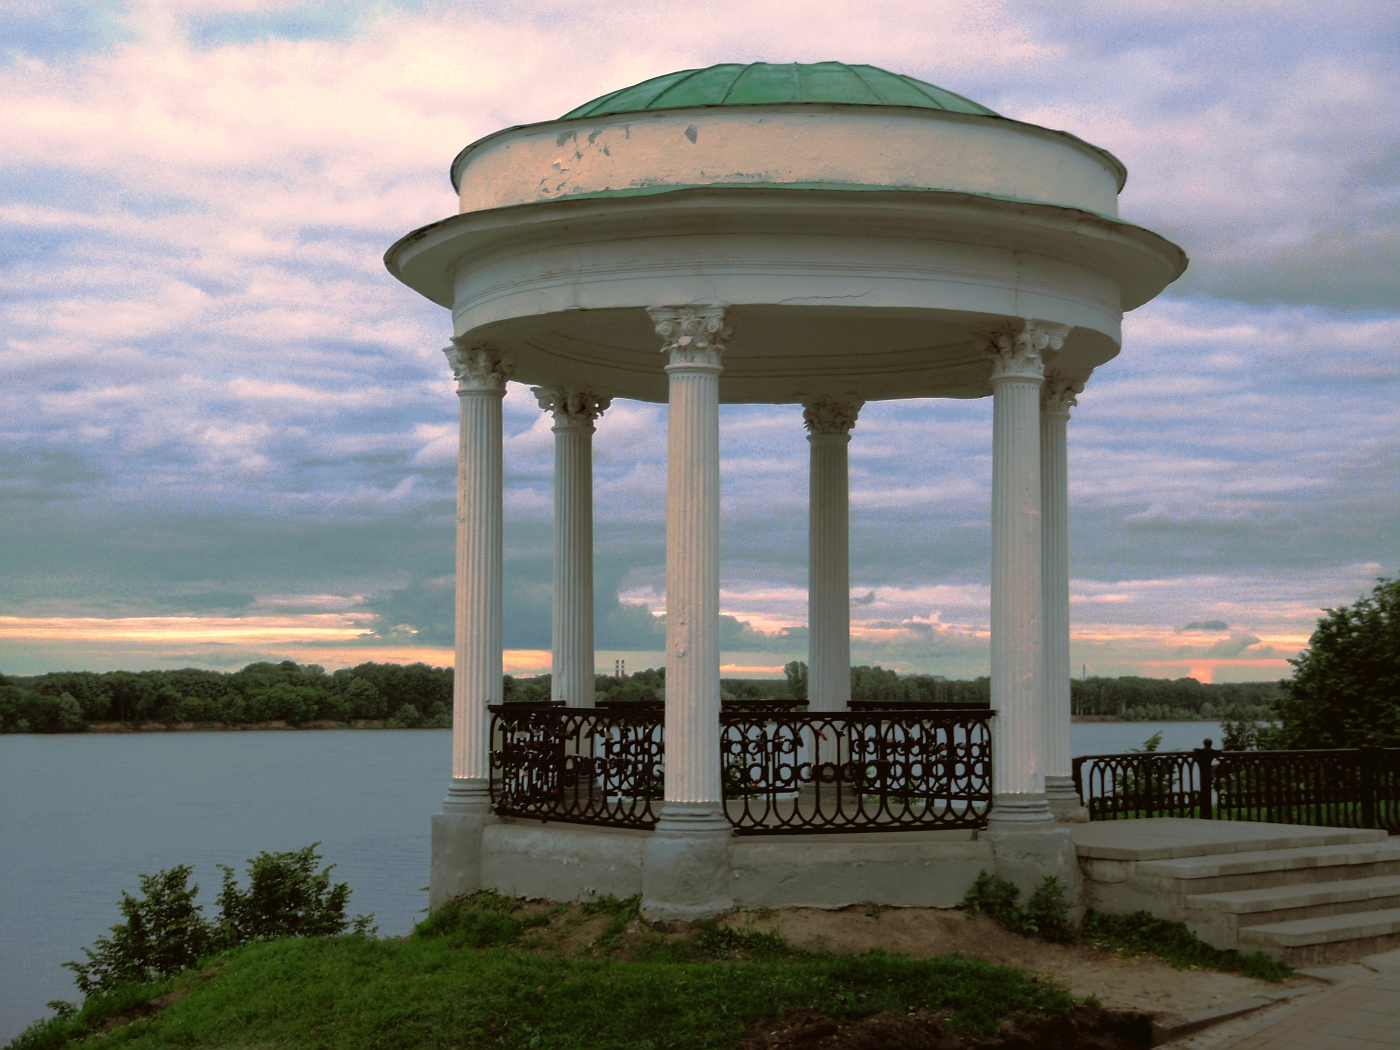 Pavilion on the Volga